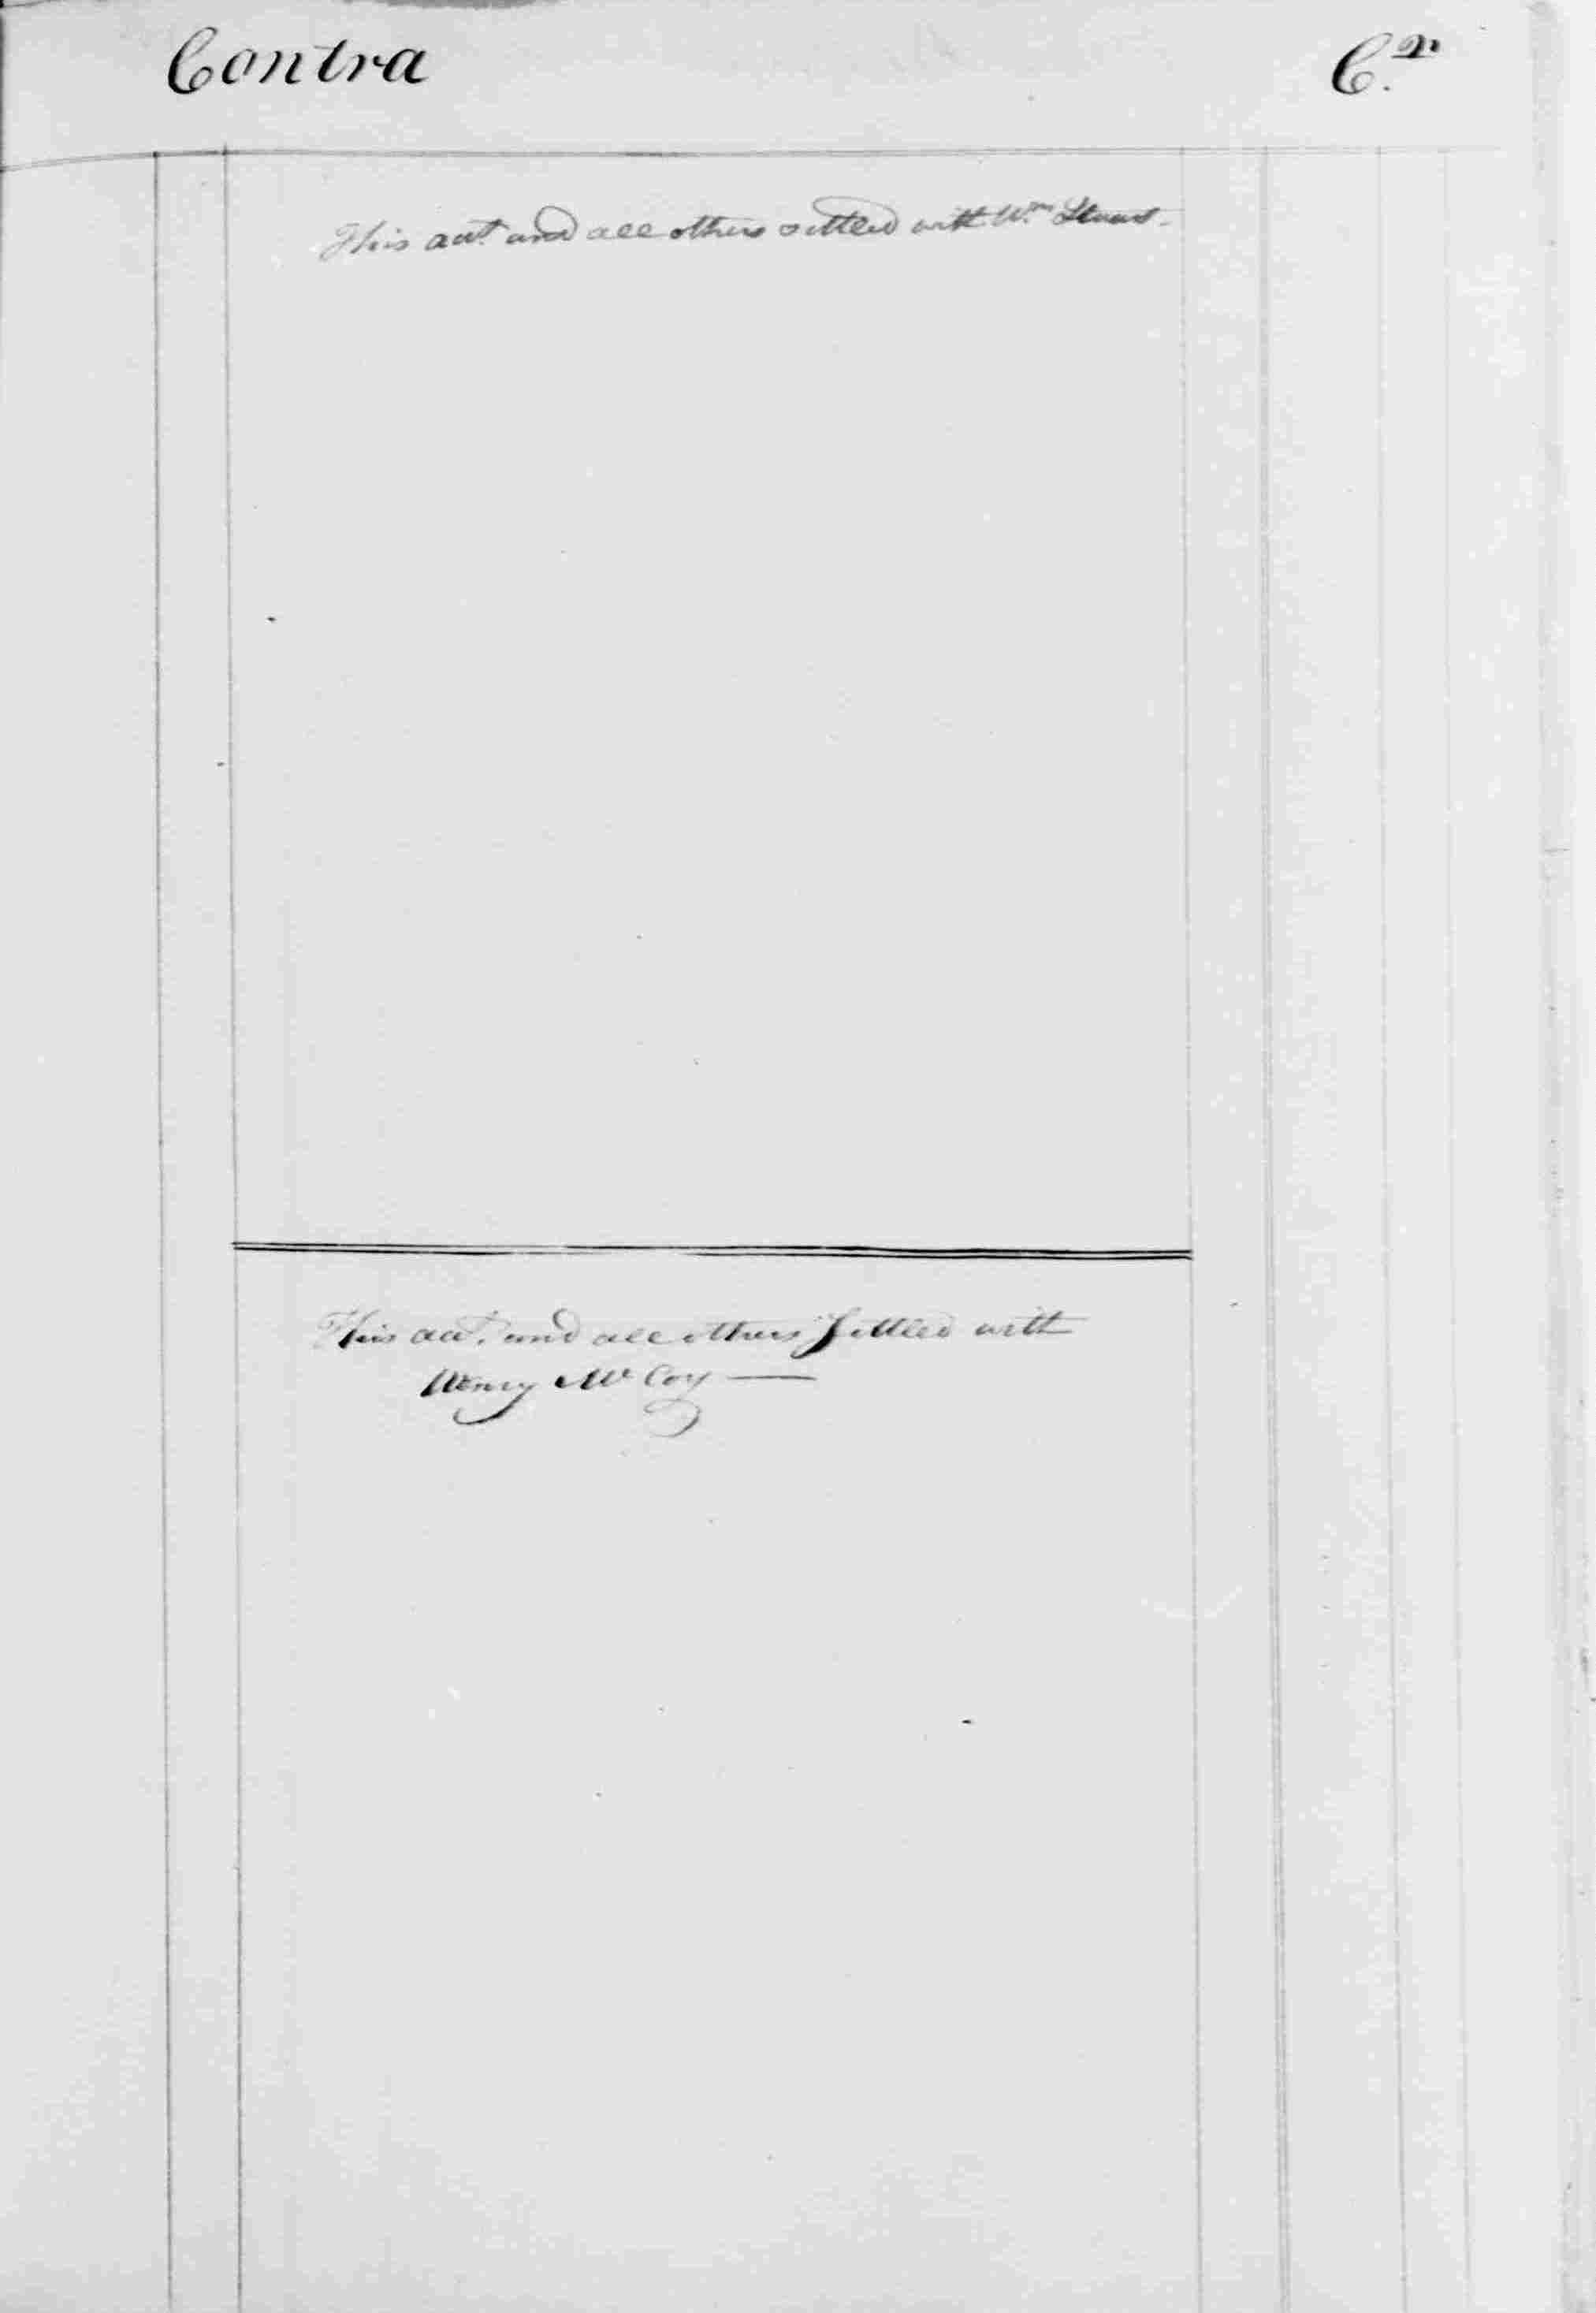 Ledger B, folio 364, right side